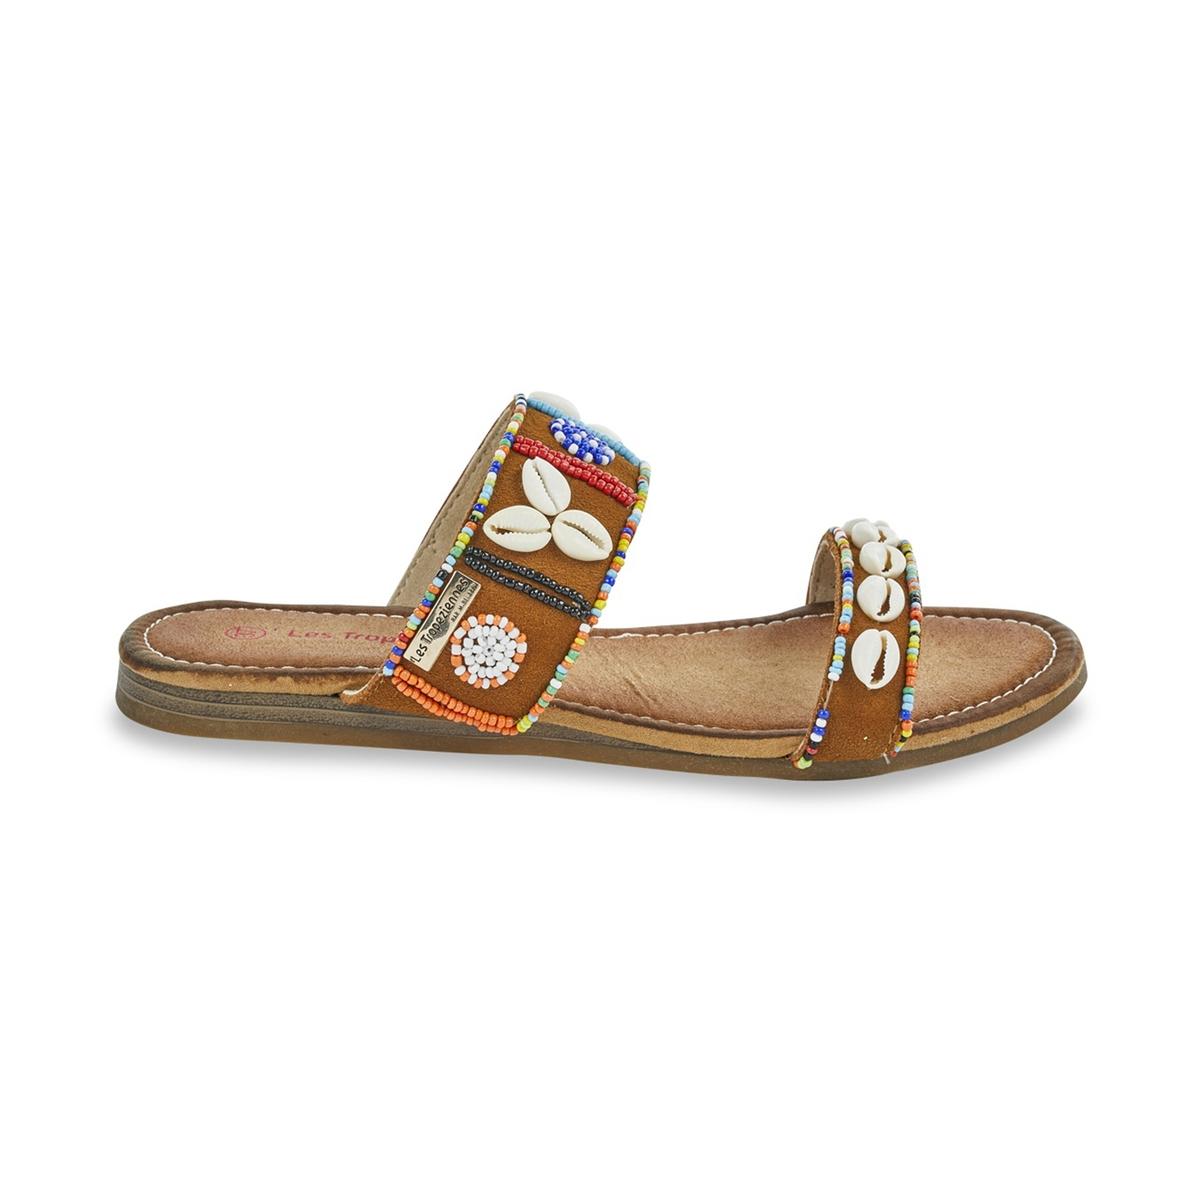 Туфли без задника, из кожи, Galet туфли сабо без задника palmyre